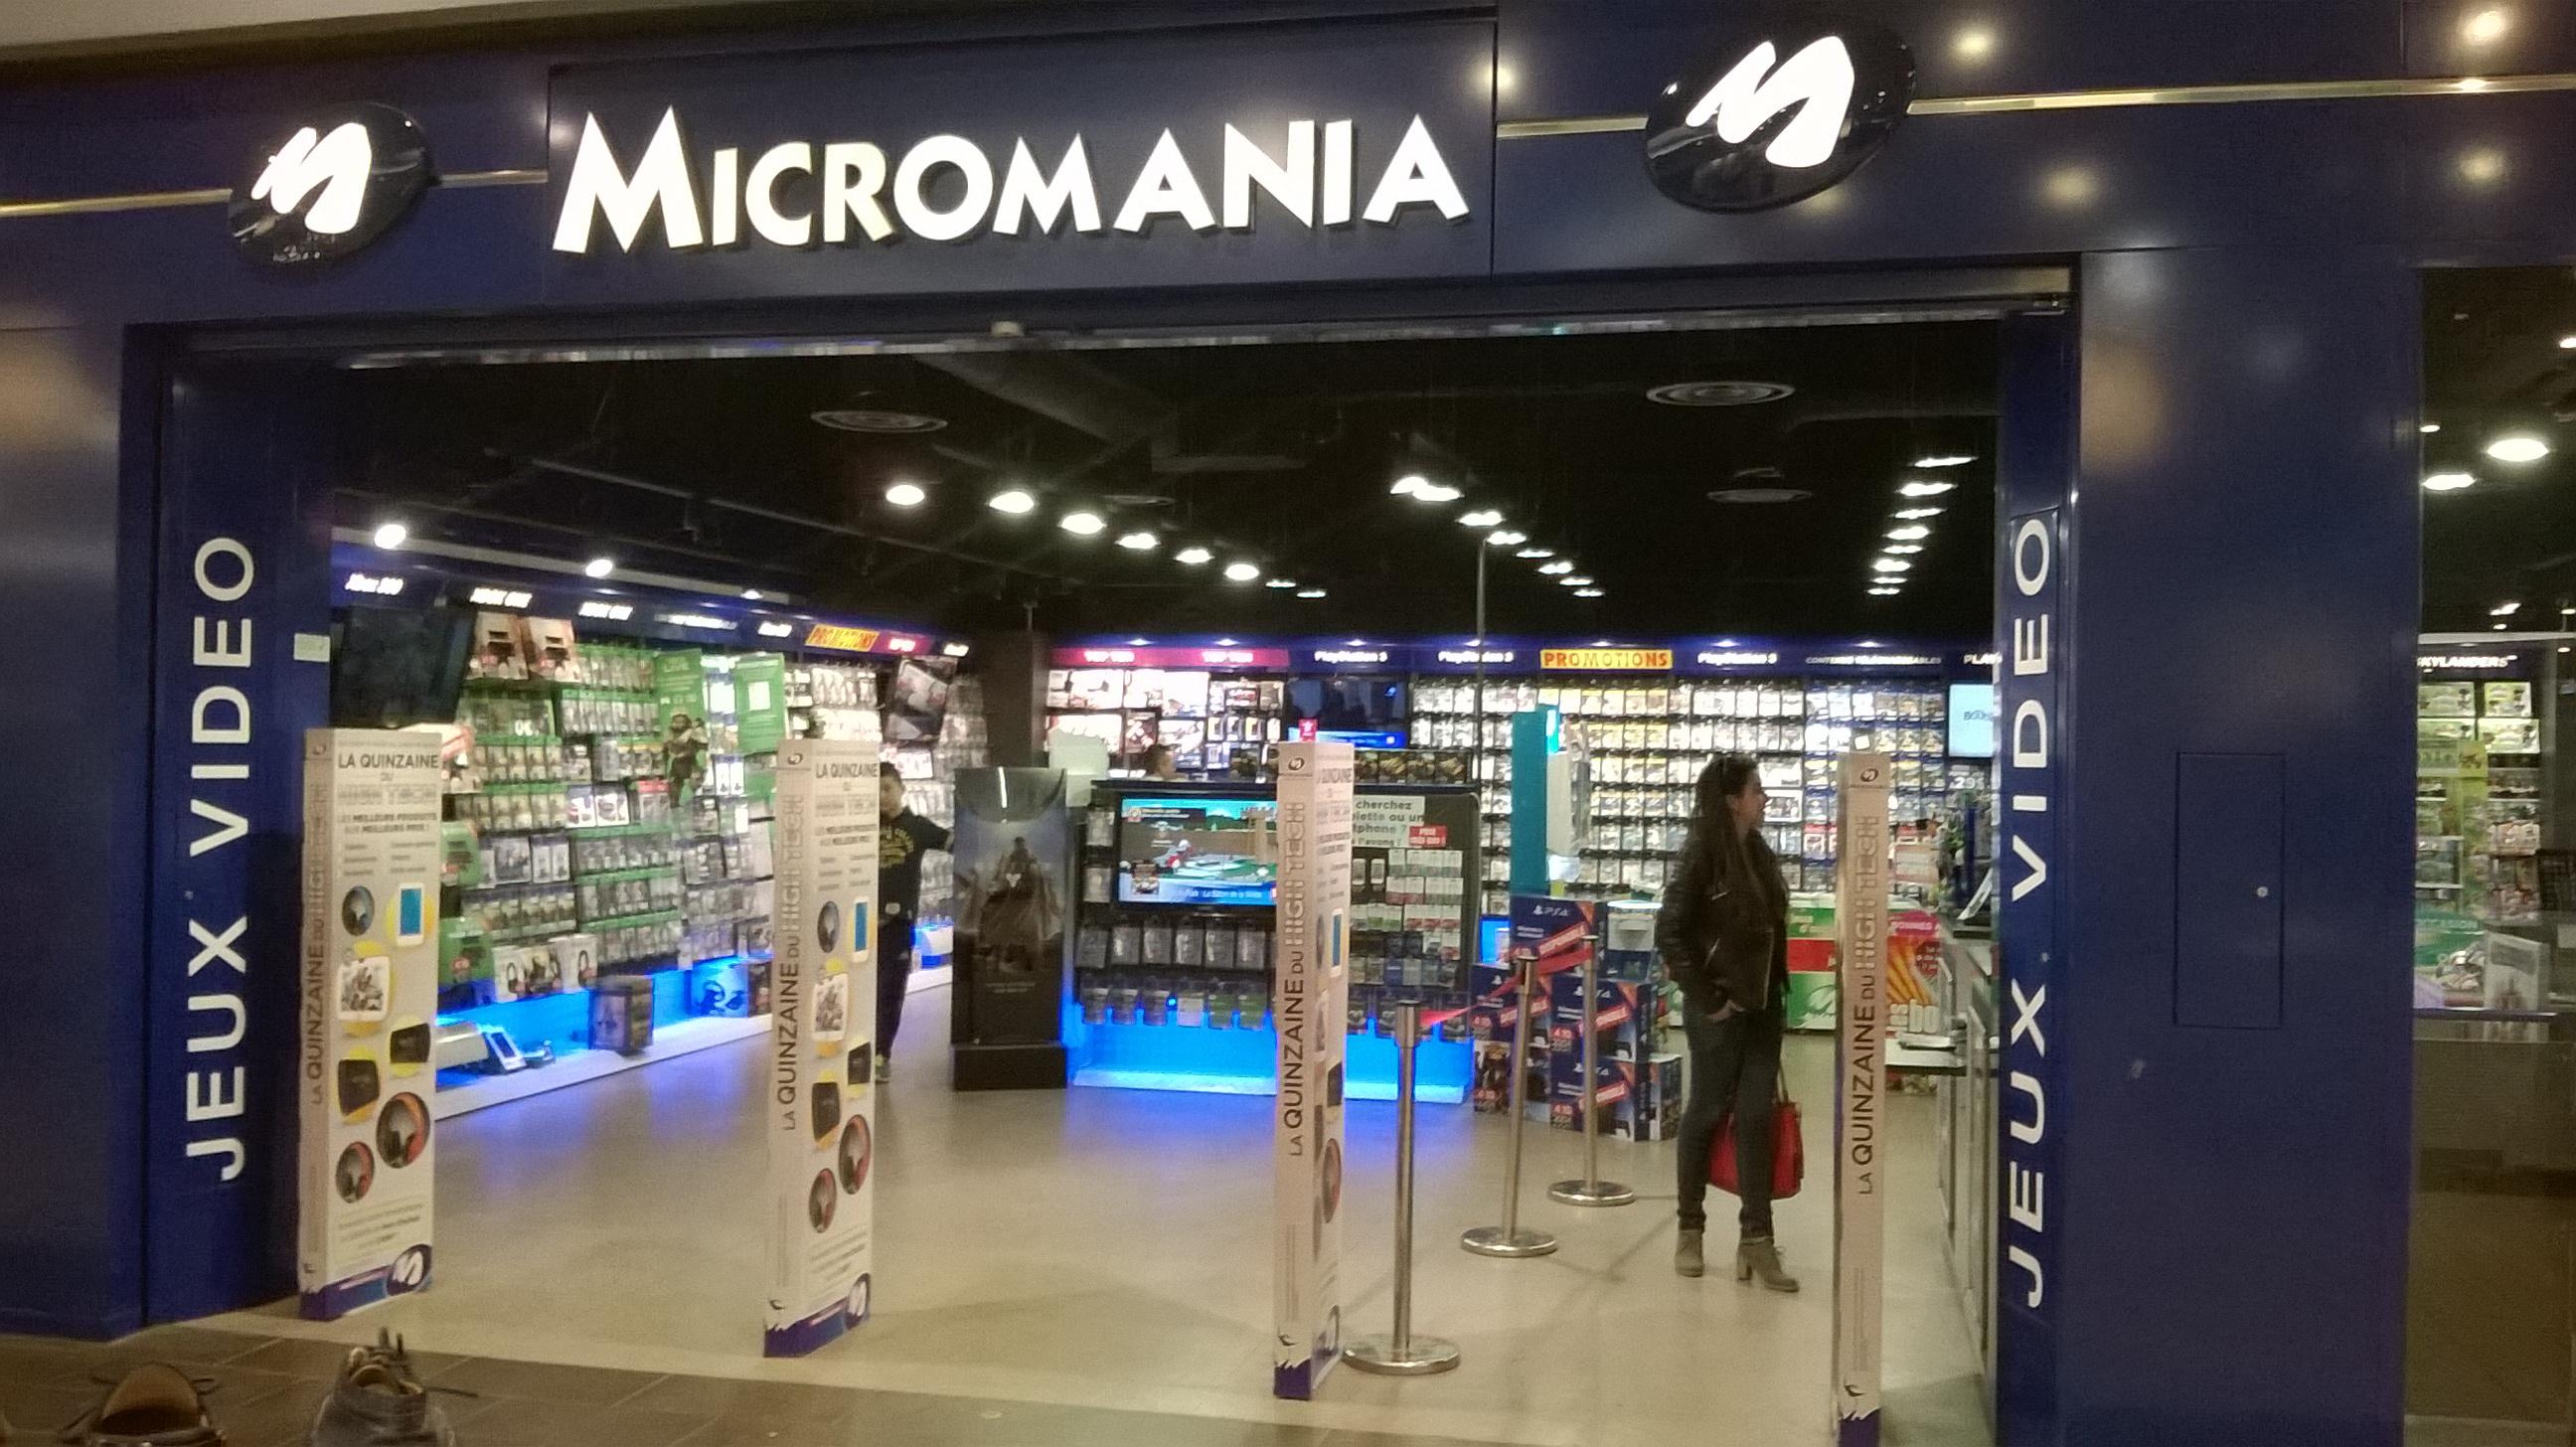 magasin micromania la valentine infos et adresse micromania. Black Bedroom Furniture Sets. Home Design Ideas